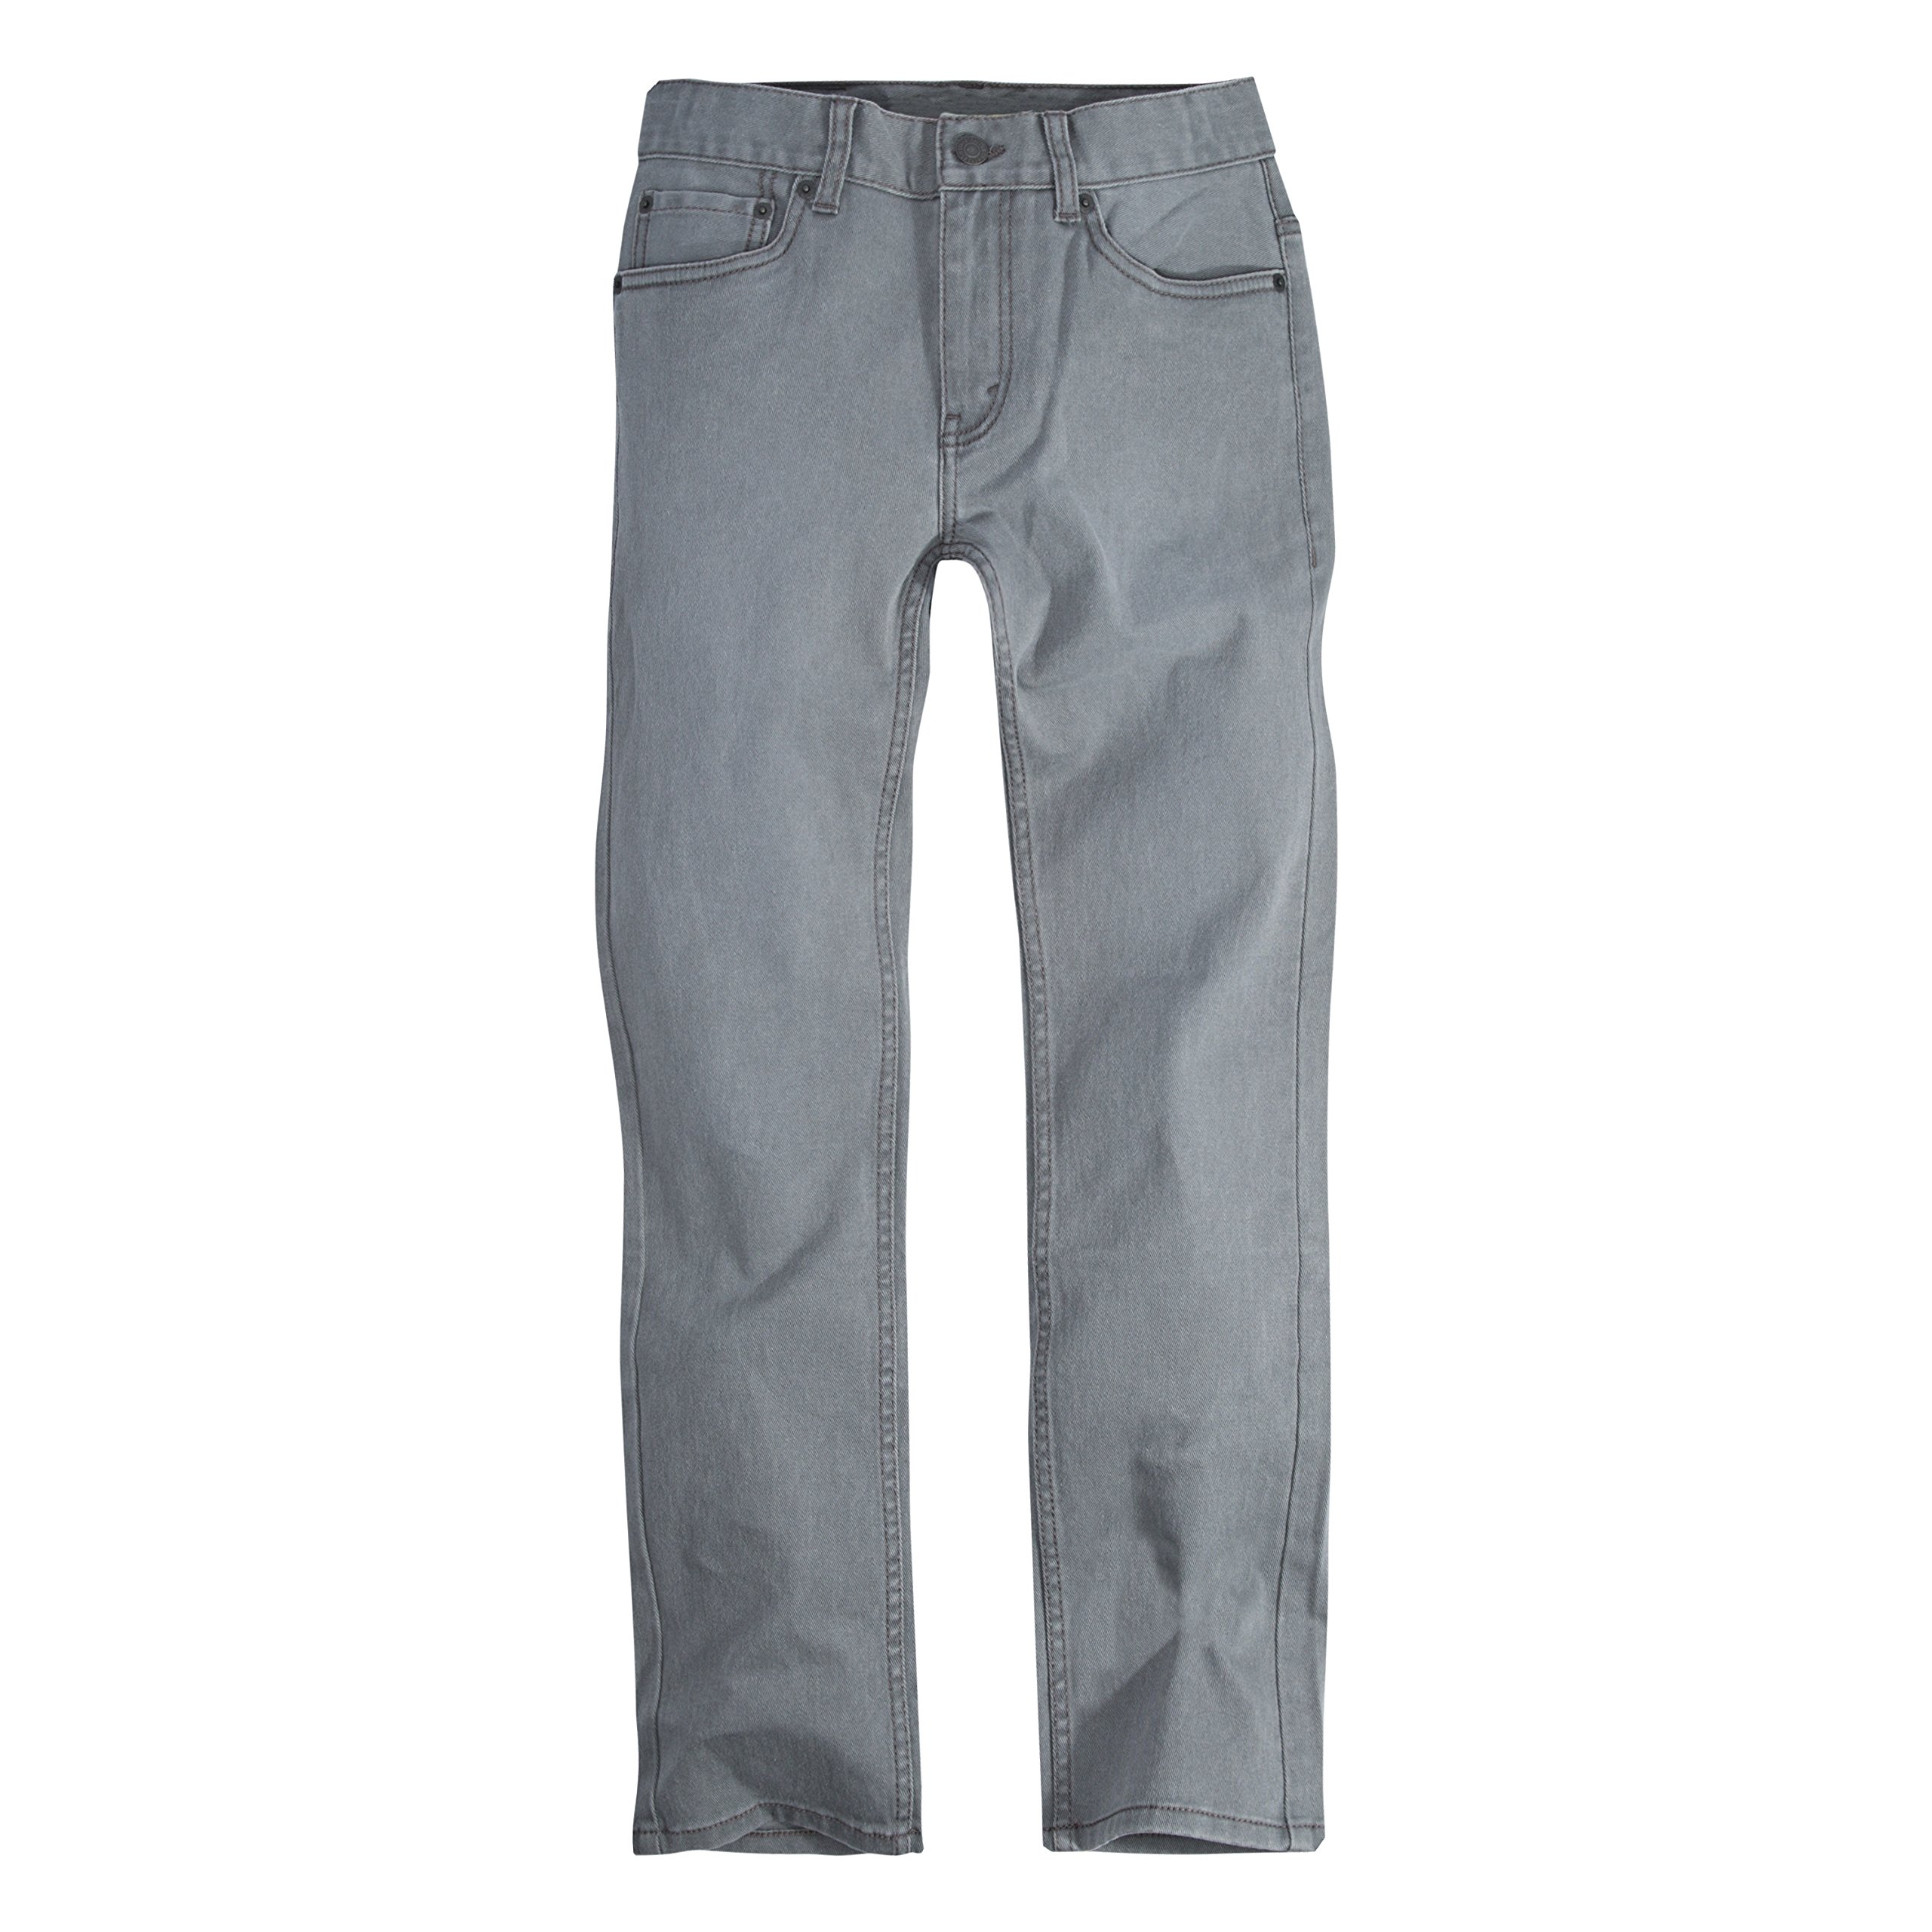 Levi's Big Boys' 511 Slim Fit Jeans, Smoked Pearl, 8